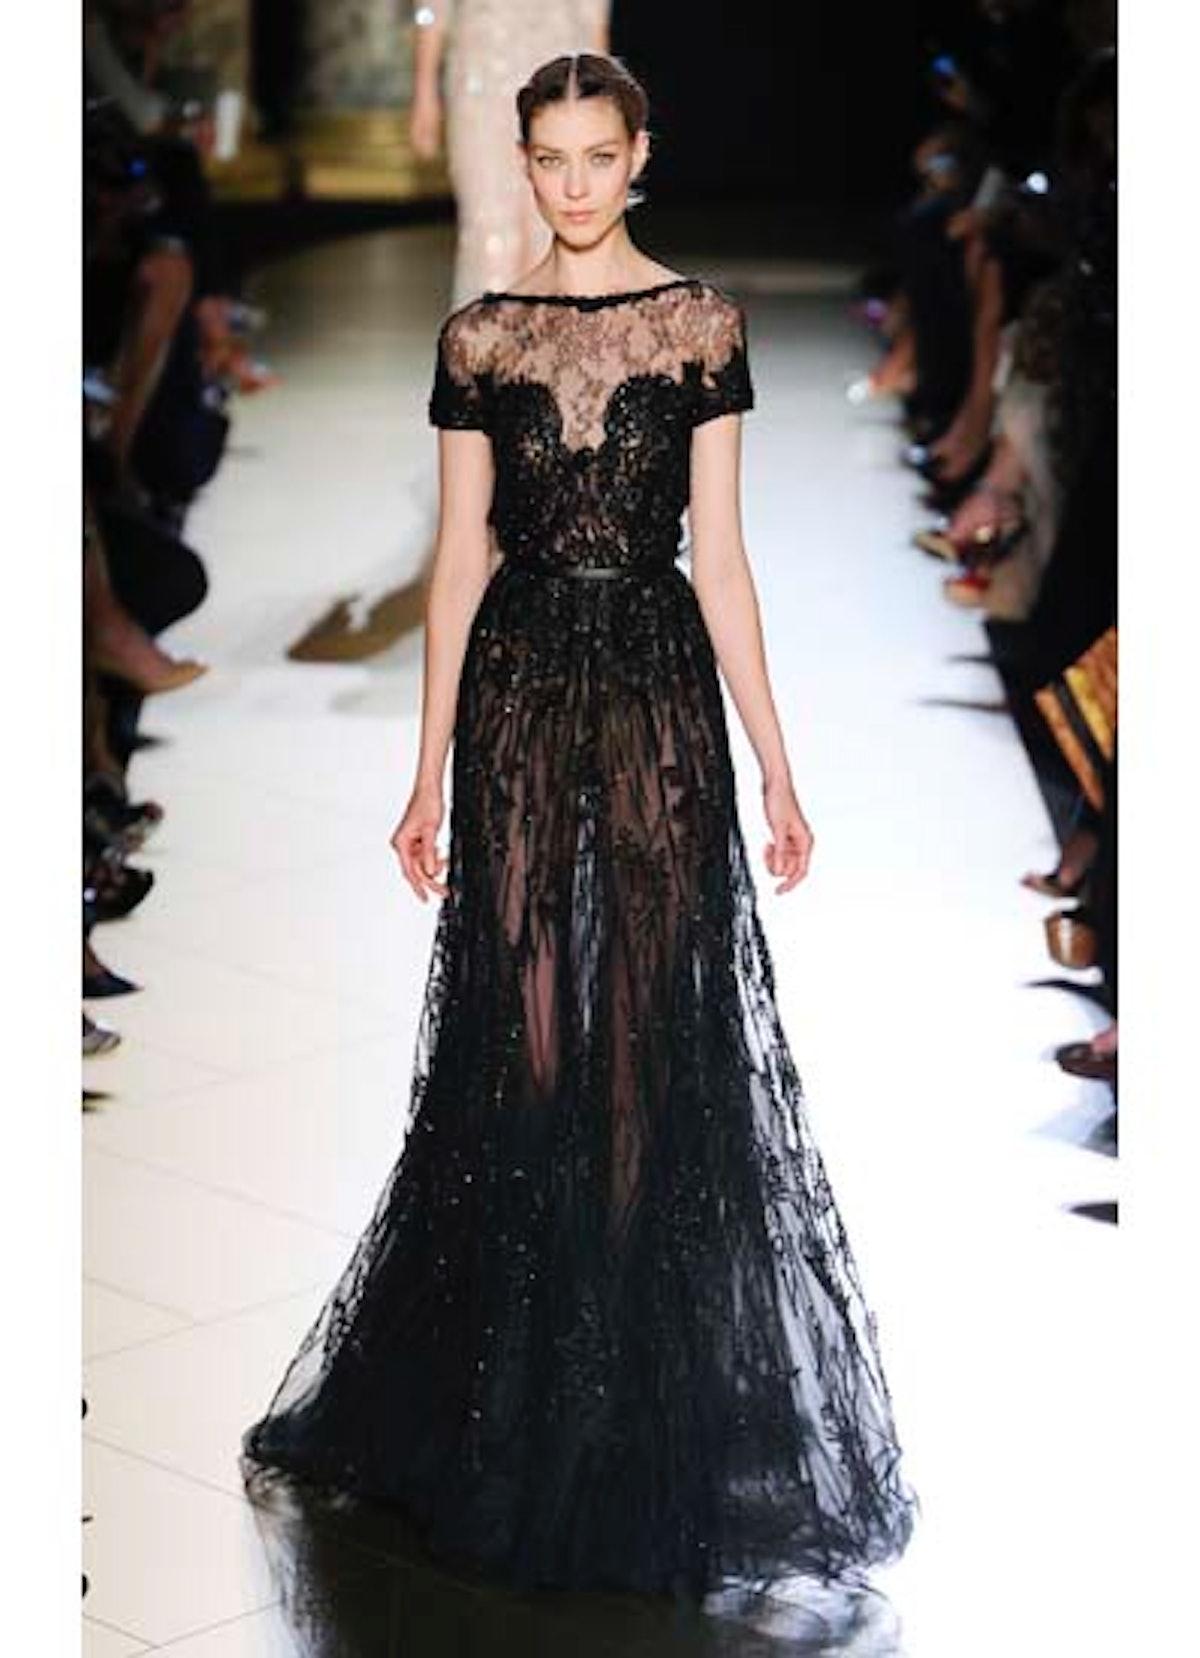 fass-elie-saab-couture-2012-runway-07-v.jpg